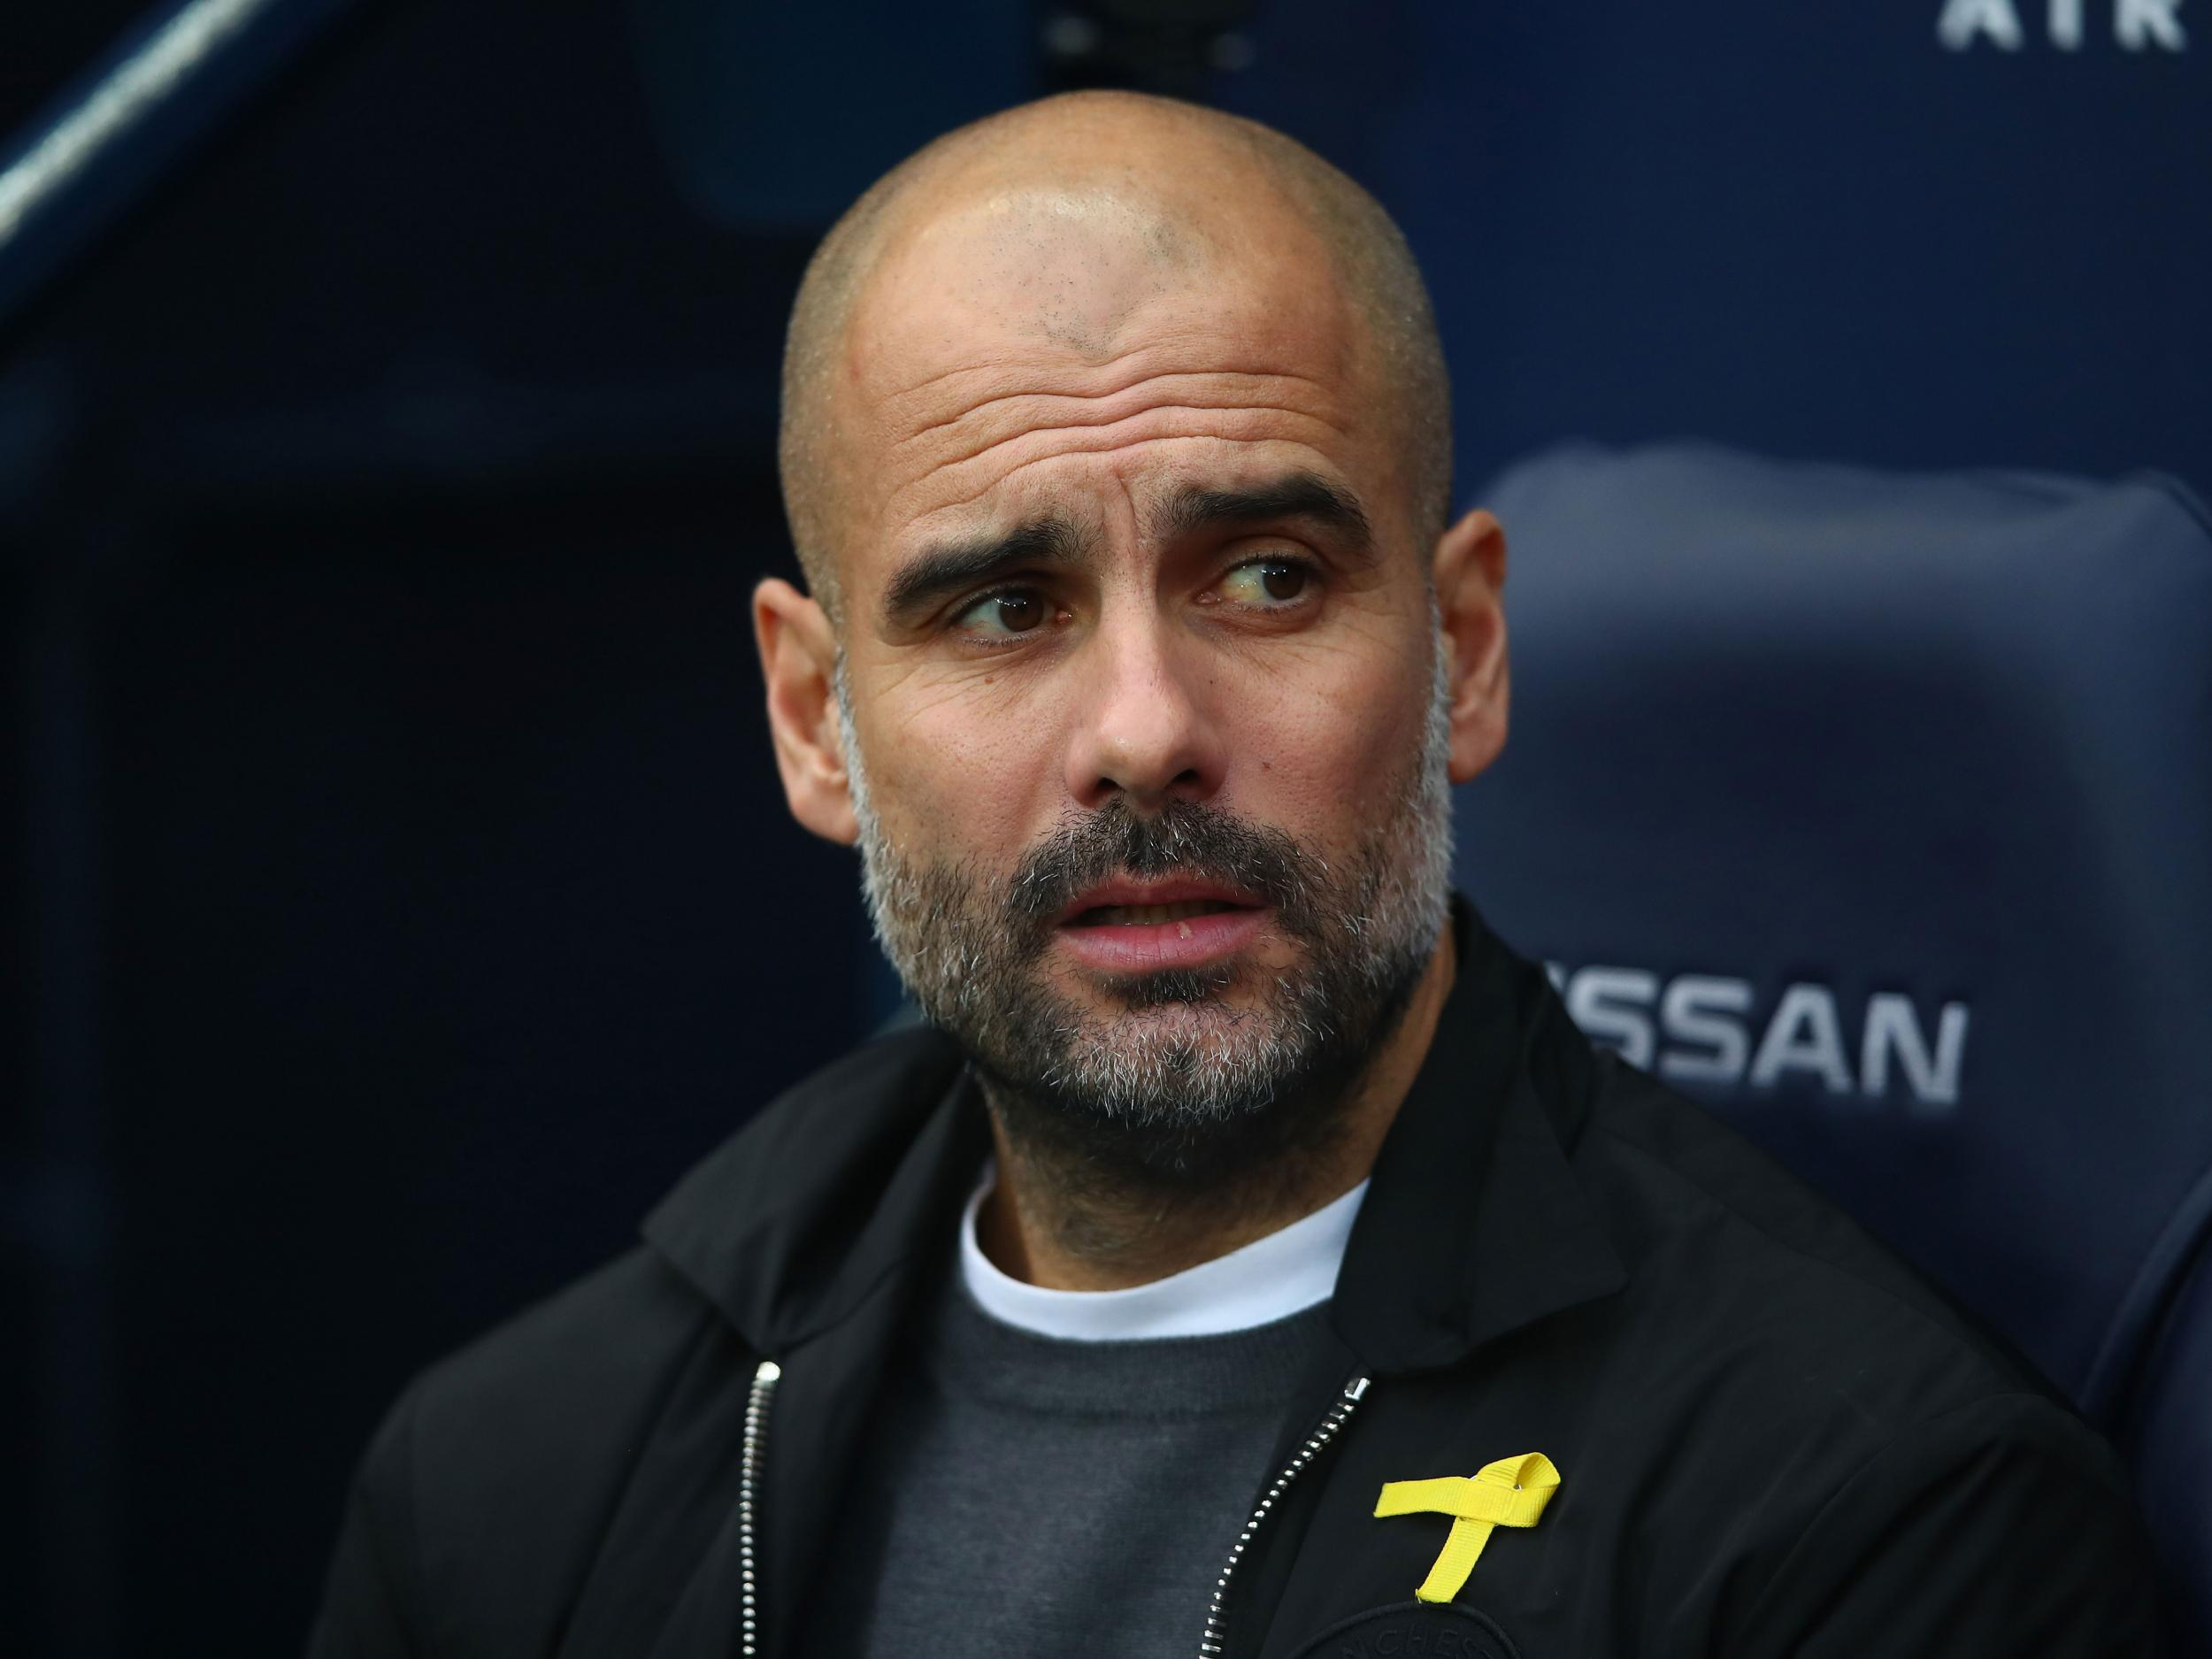 Pep Guardiola | FIFA Football Gaming wiki